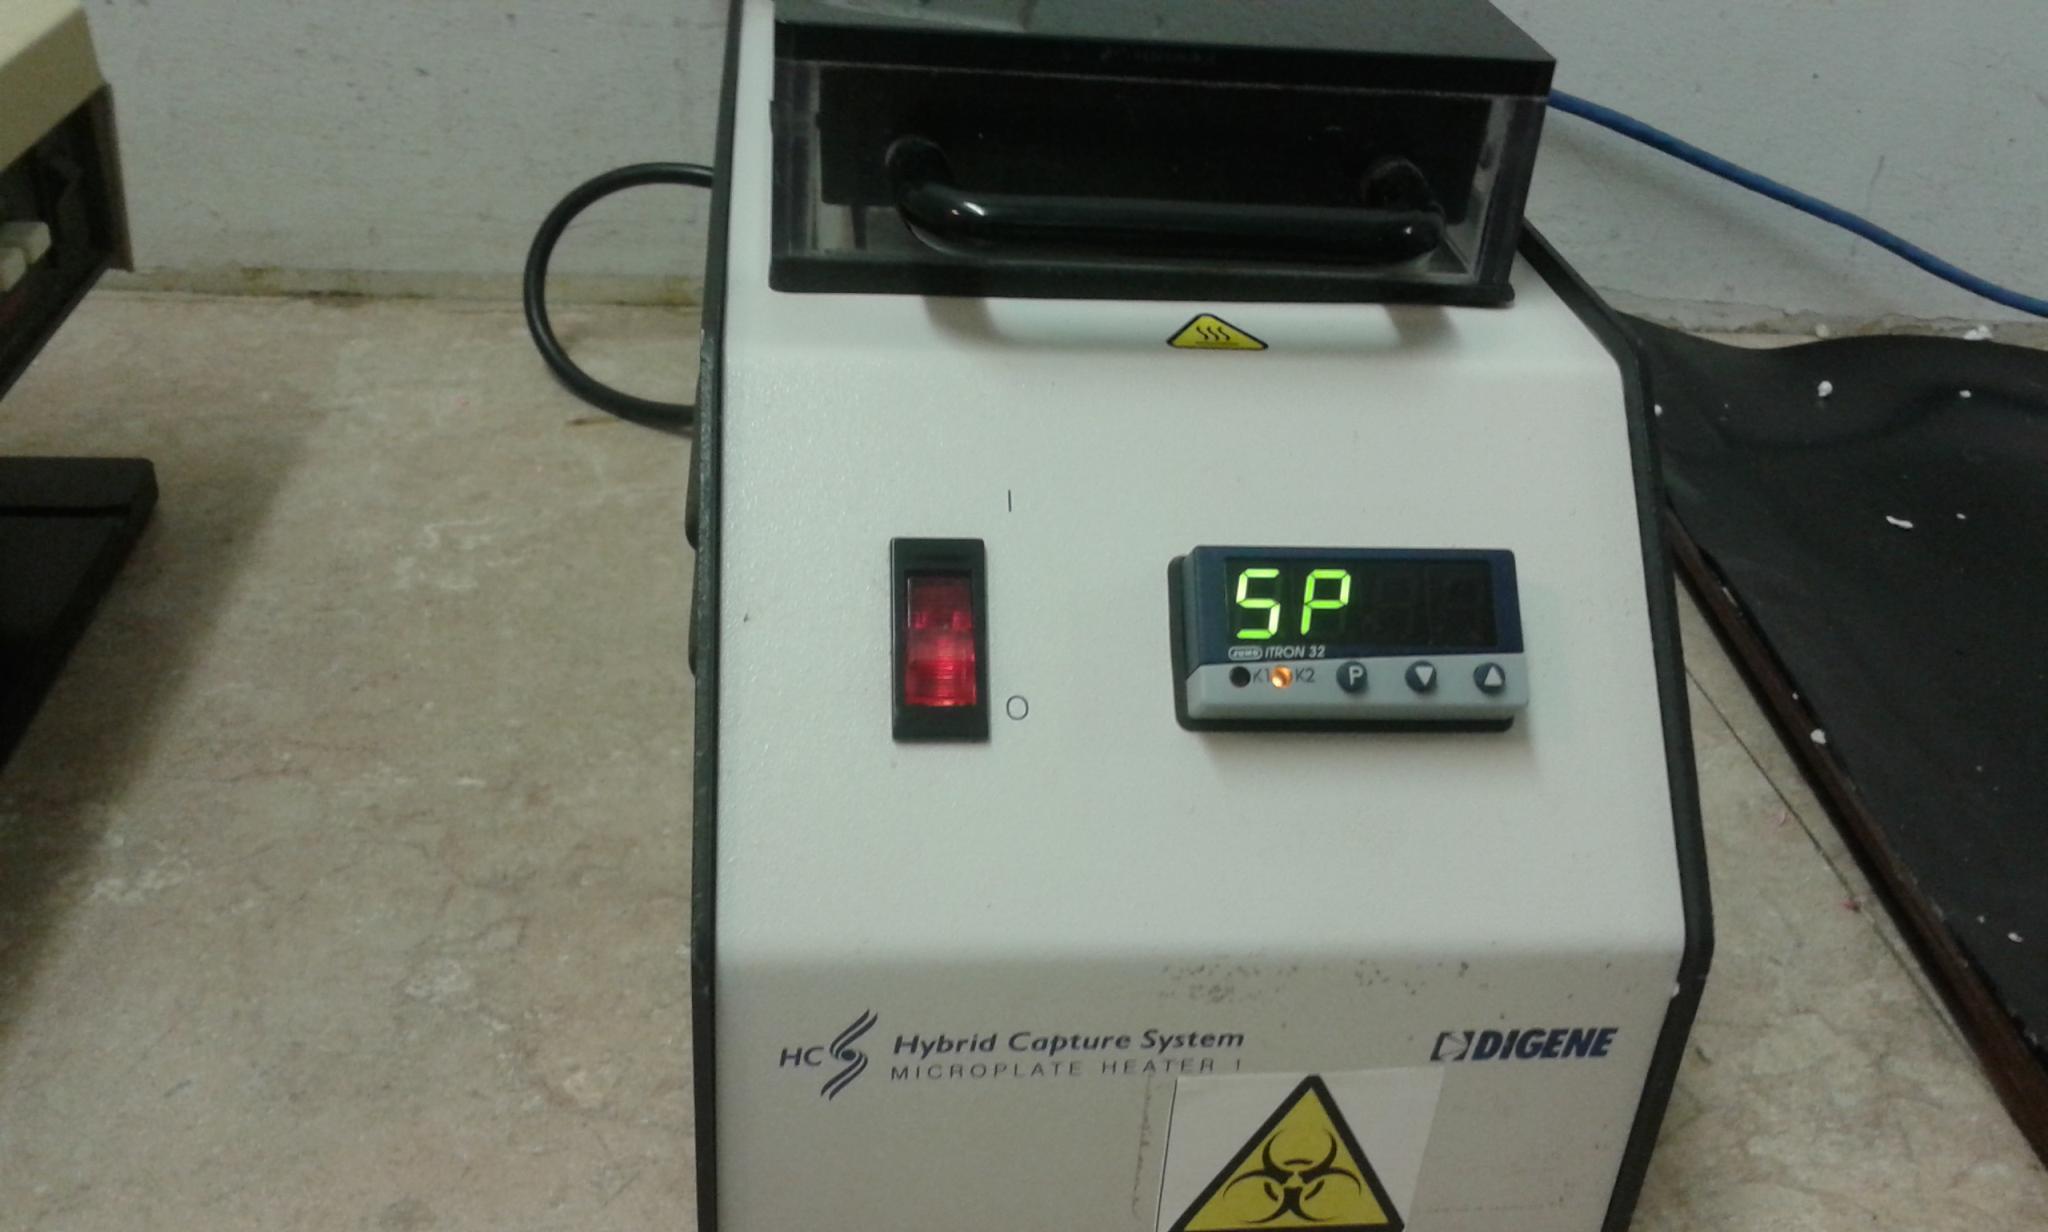 Programmable Microplate Heater Digene Hybrid Capture System